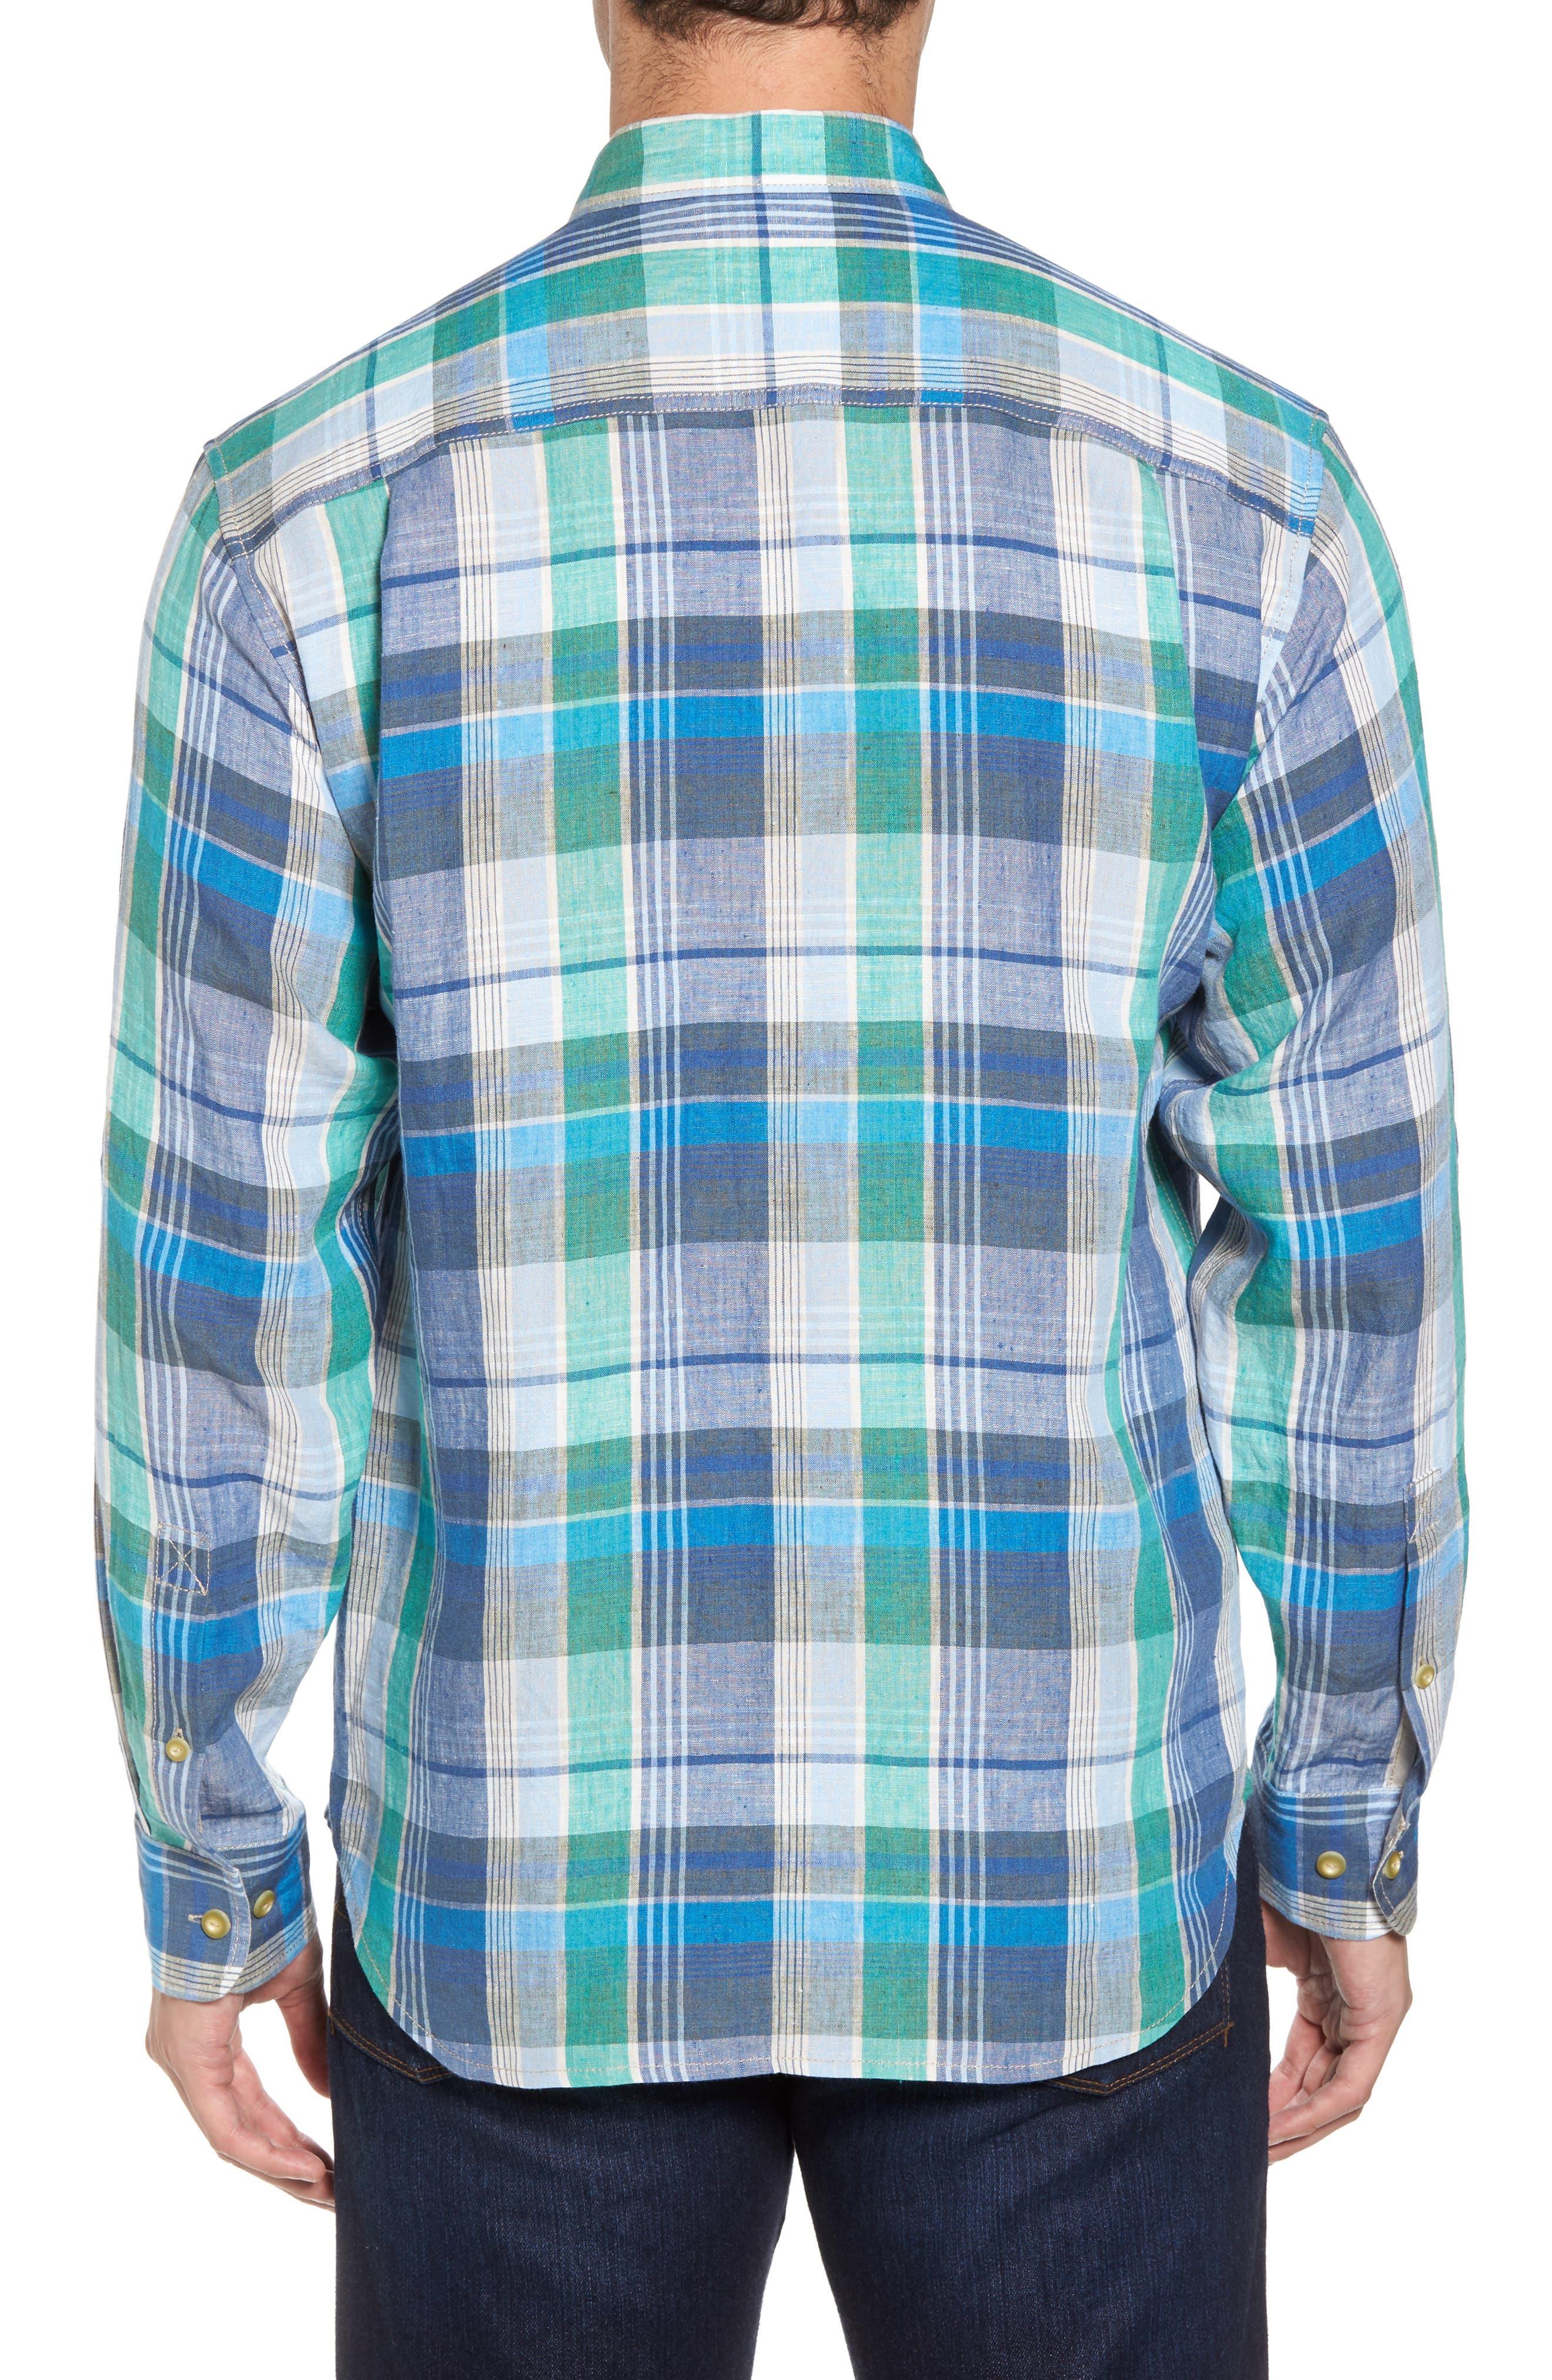 Vero Beach Madras Plaid Linen Sport Shirt,                             Alternate thumbnail 2, color,                             300